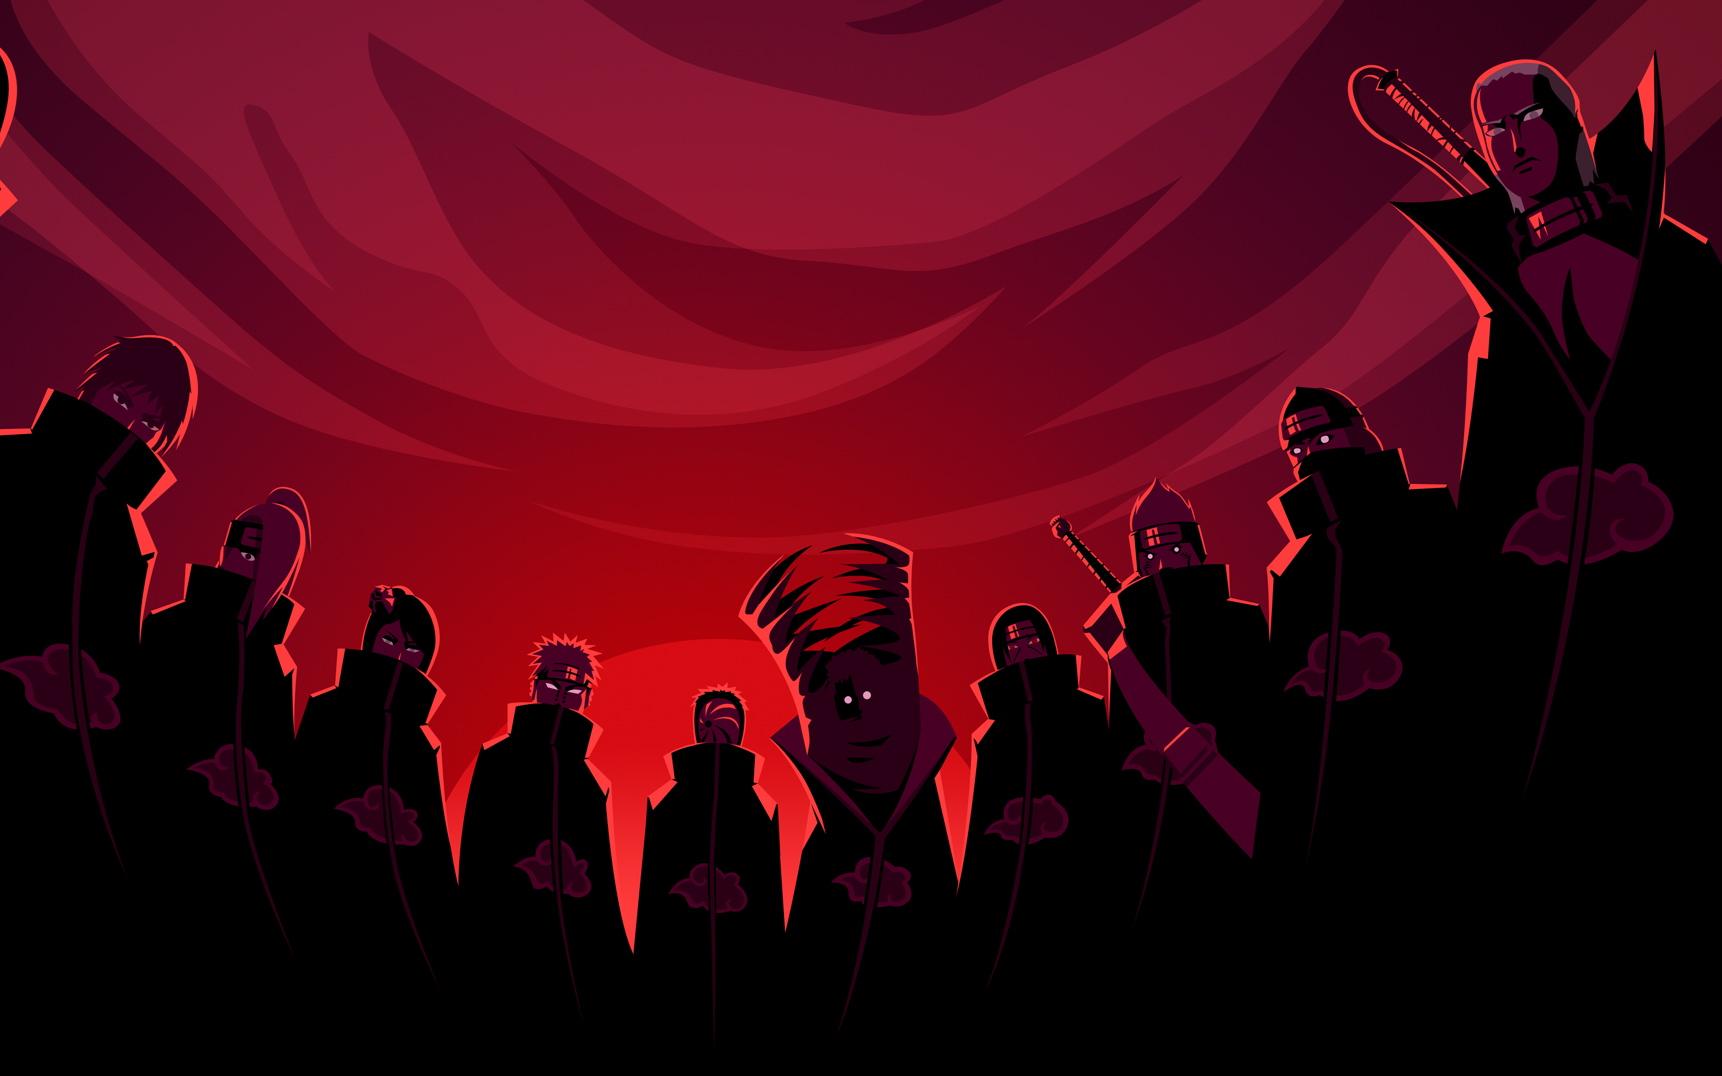 Wonderful Wallpaper Naruto Silhouette - NARUTO  Picture.jpg